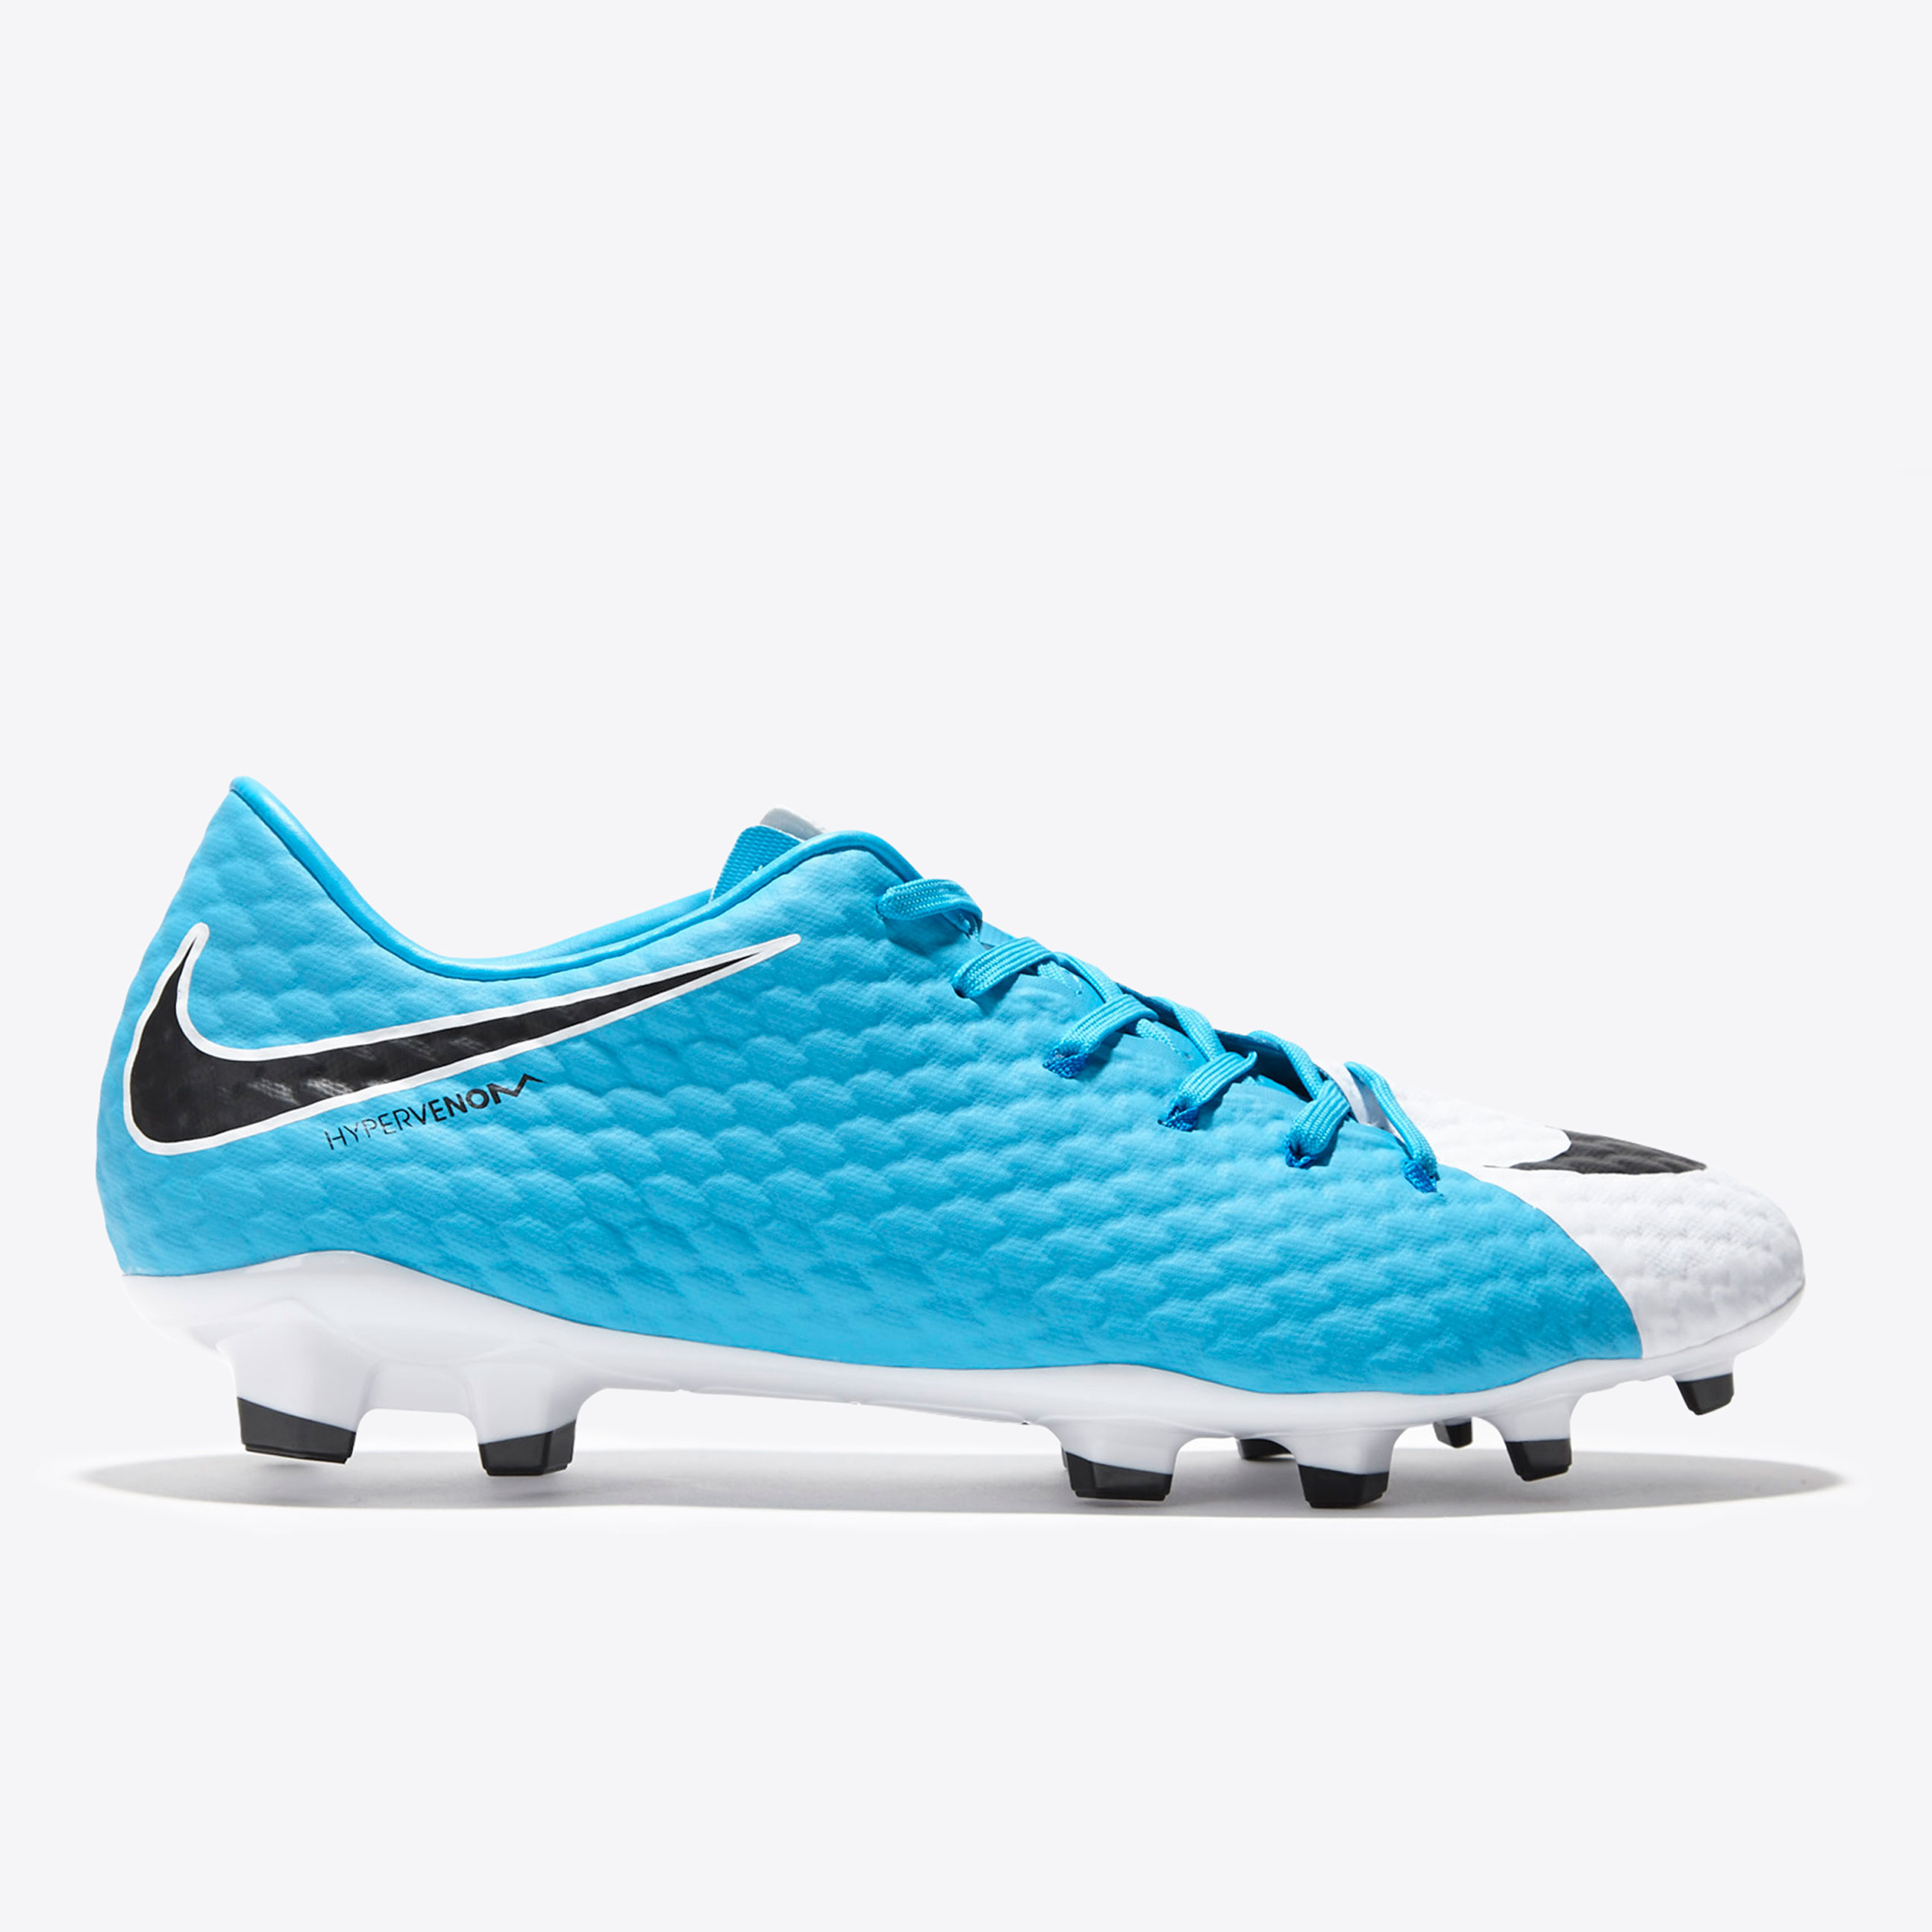 Nike Hypervenom Phelon III Firm Ground Football Boots - White/Black/Ph